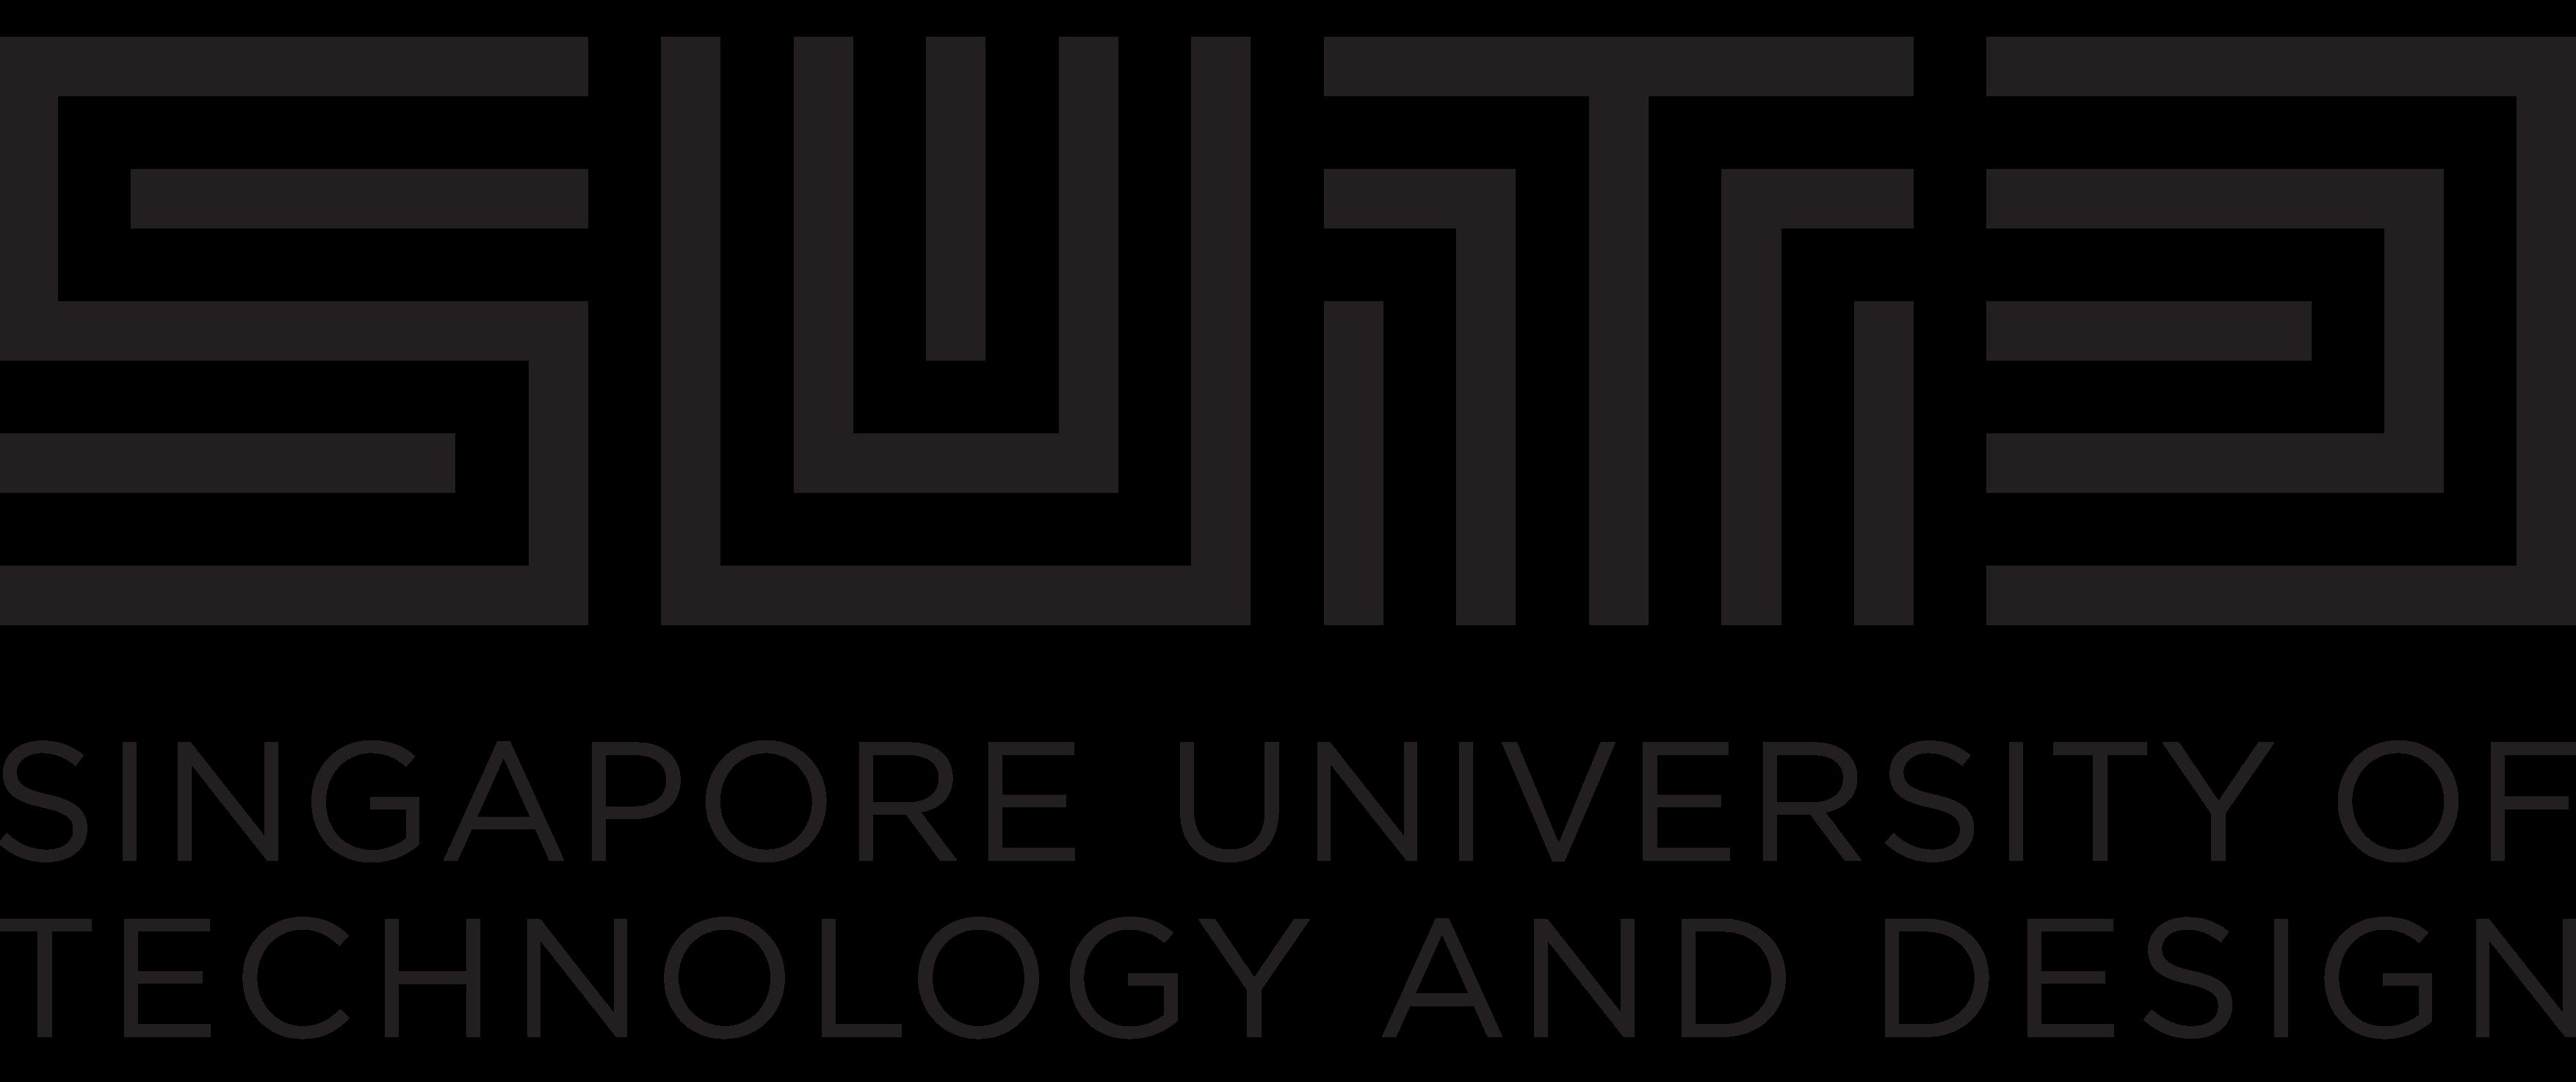 Singapore University of Technology and Design (SUTD) Logo